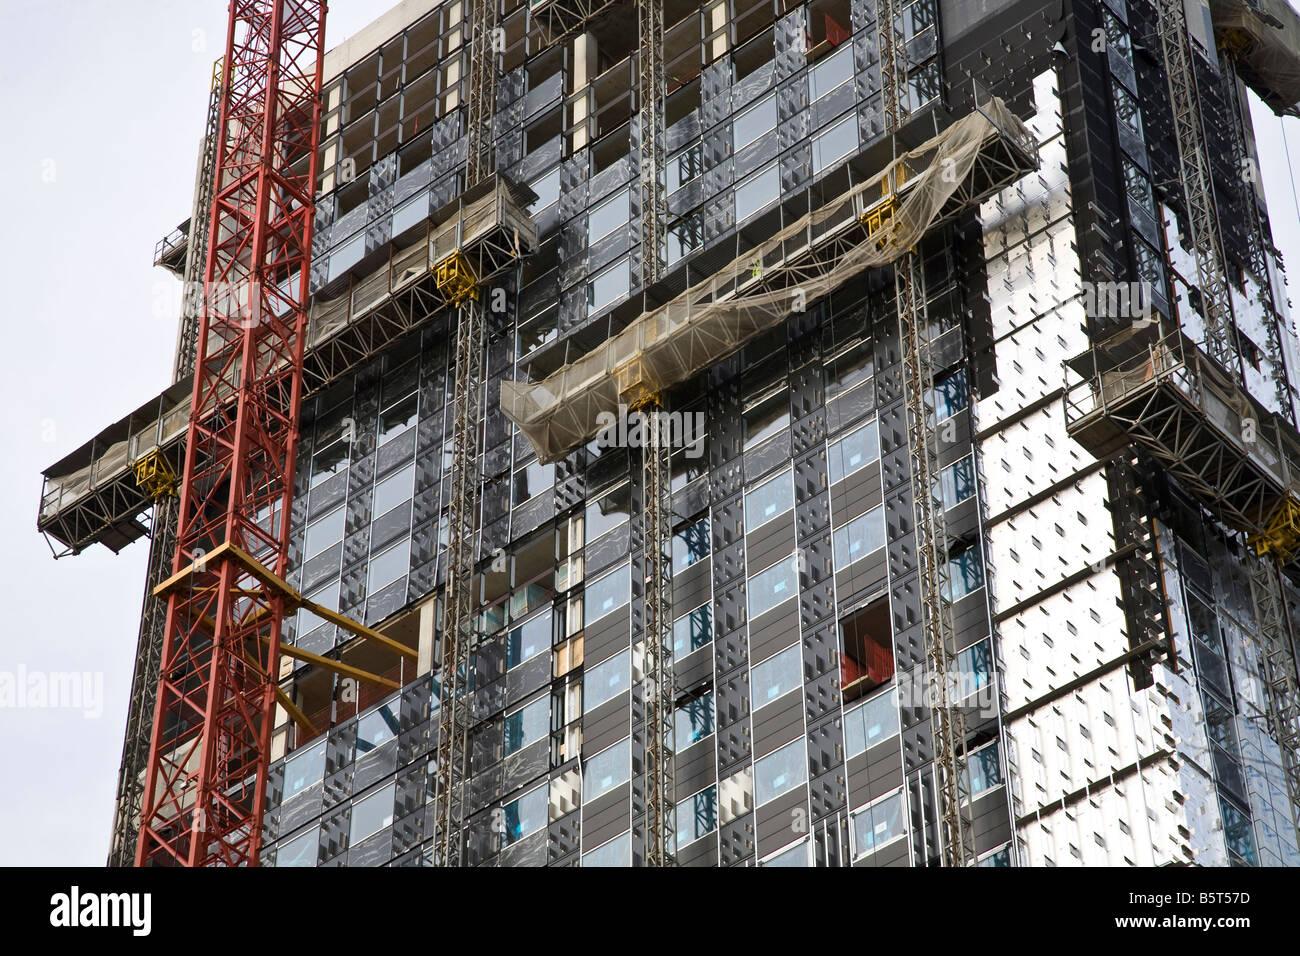 Tower block under construction in Leeds. - Stock Image